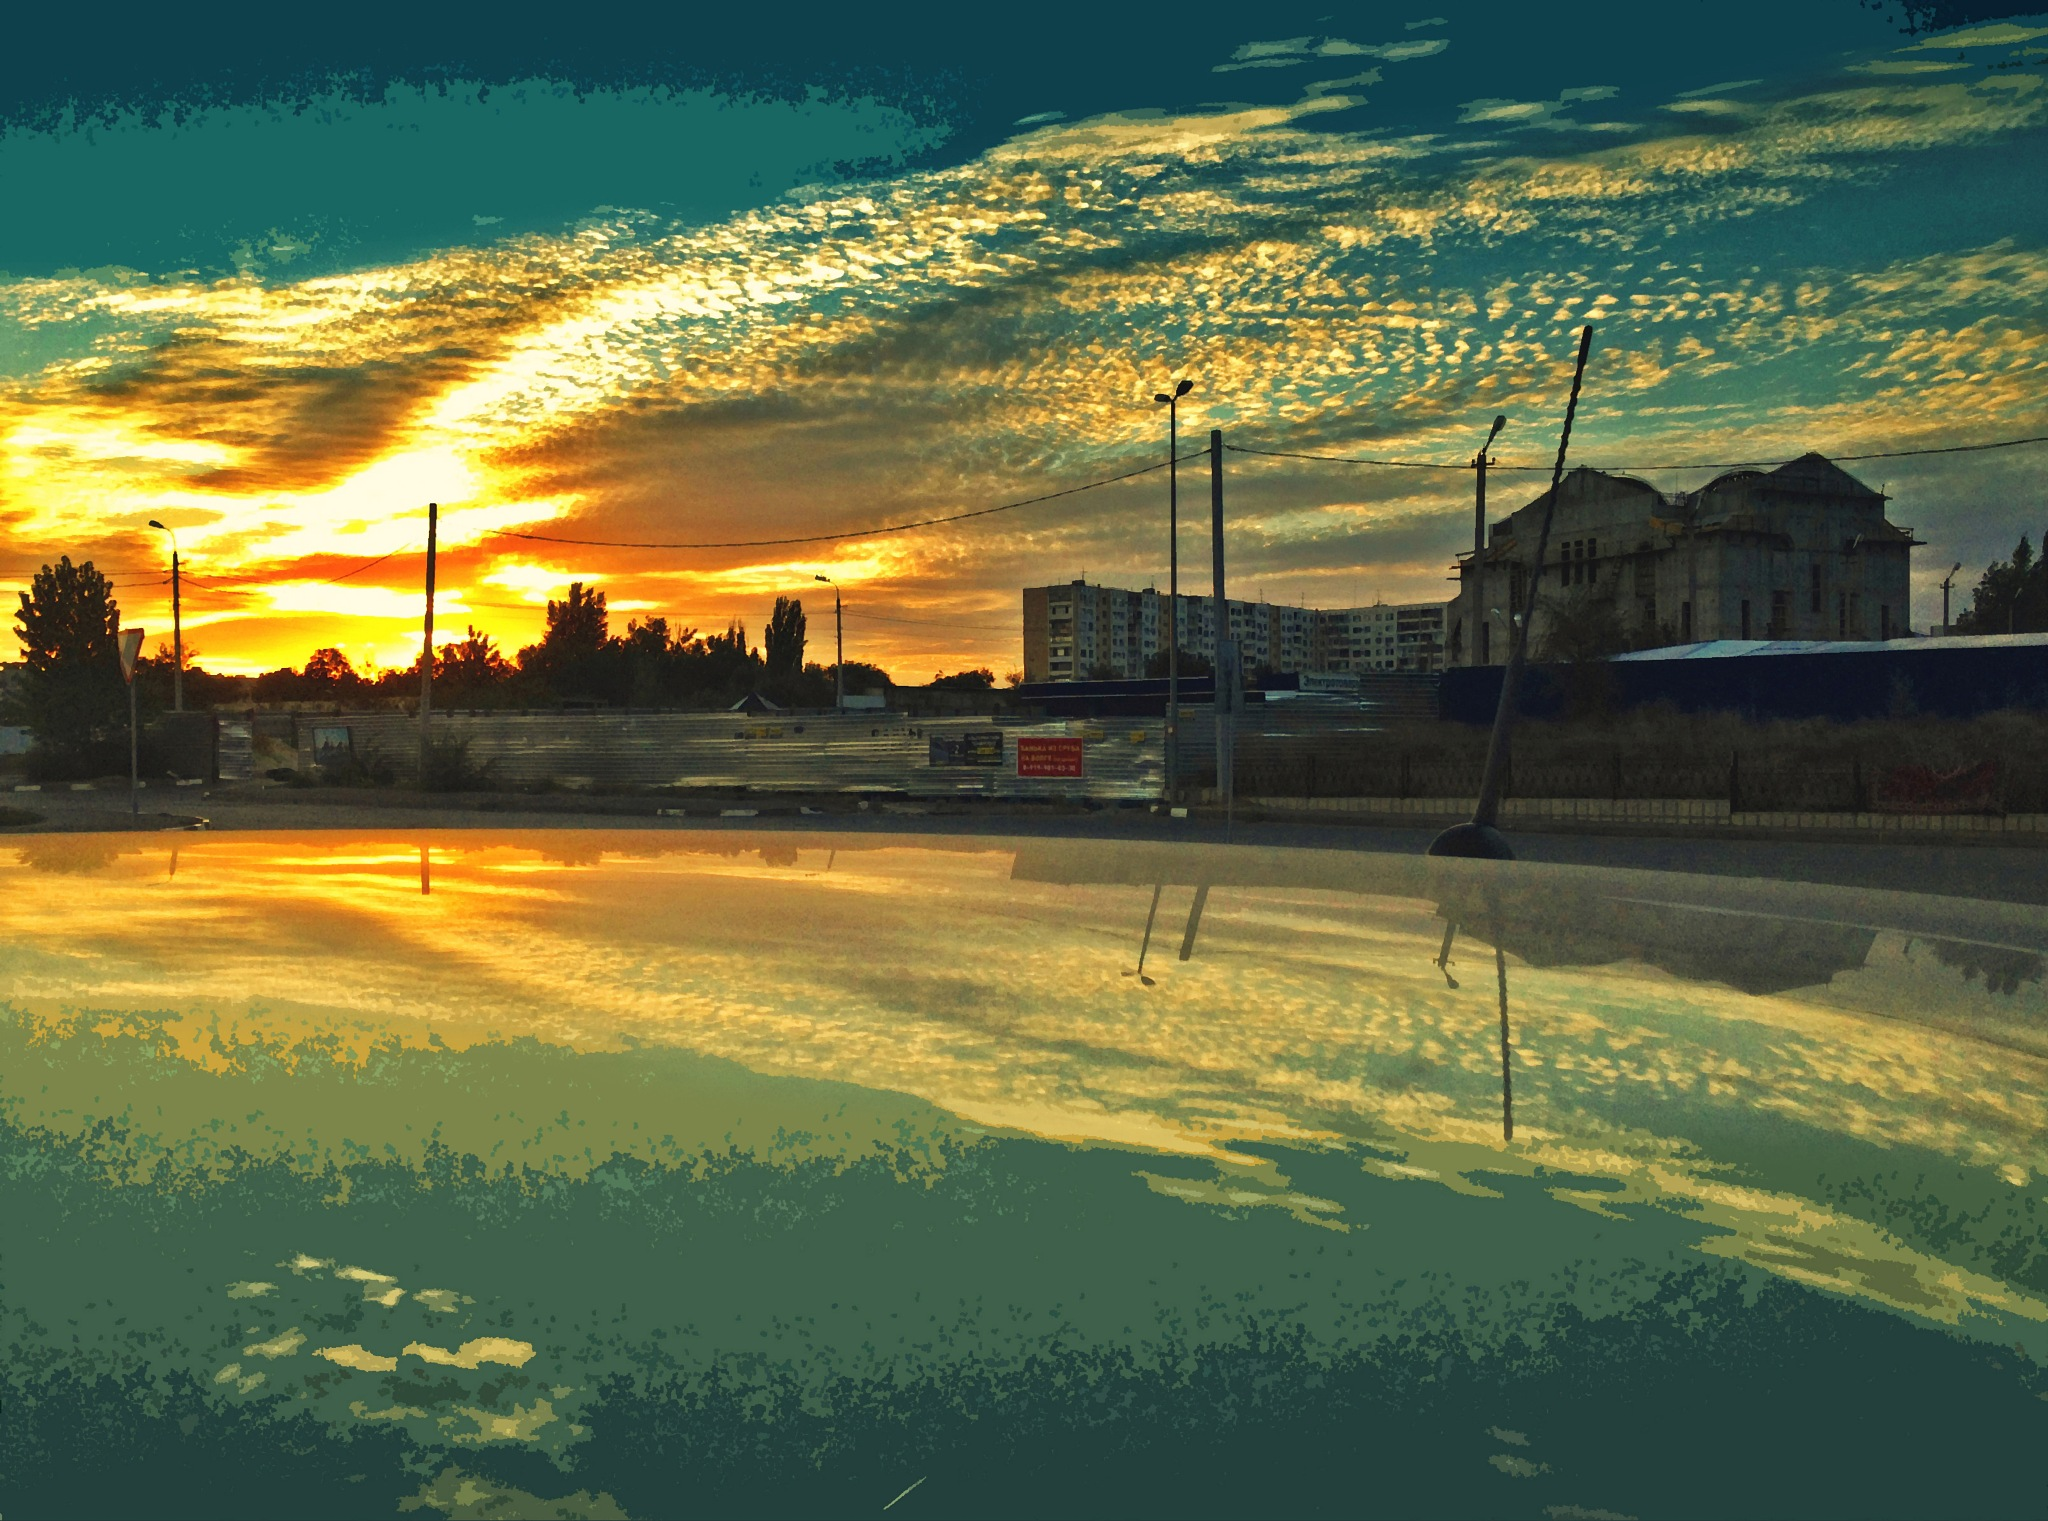 City sunset by Bobbyus